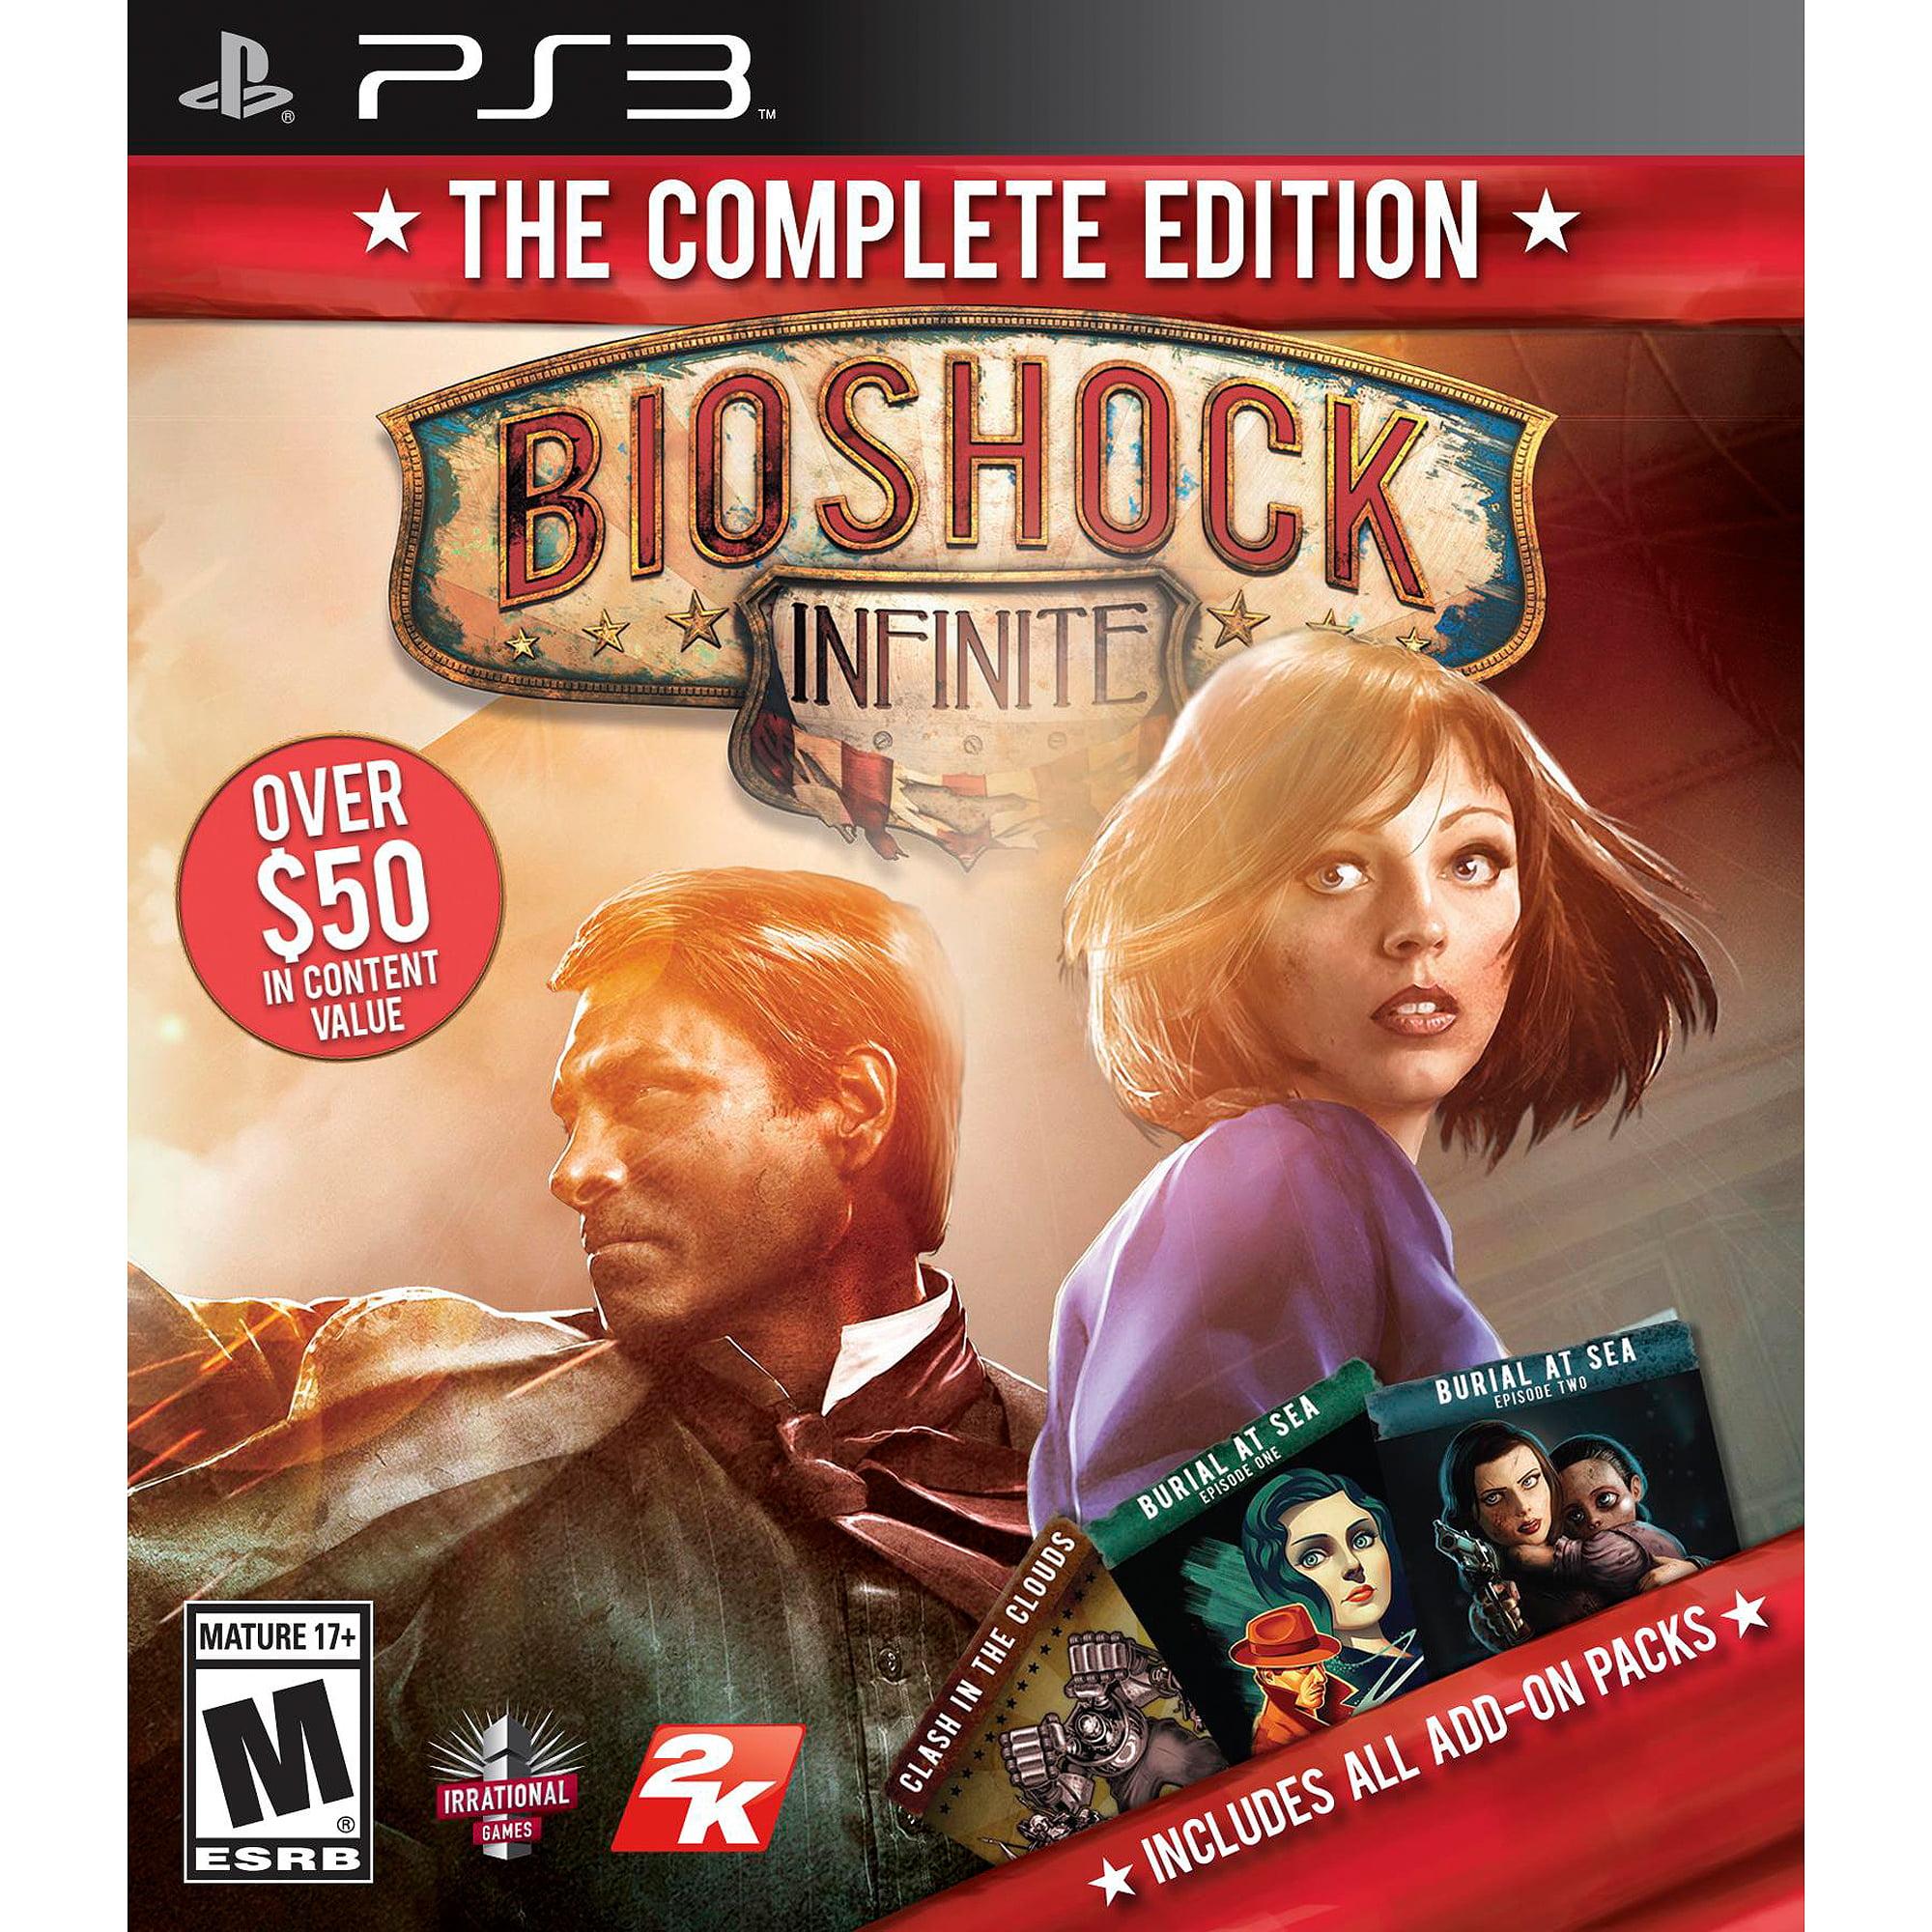 BioShock Infinite: The Complete Edition (PS3)